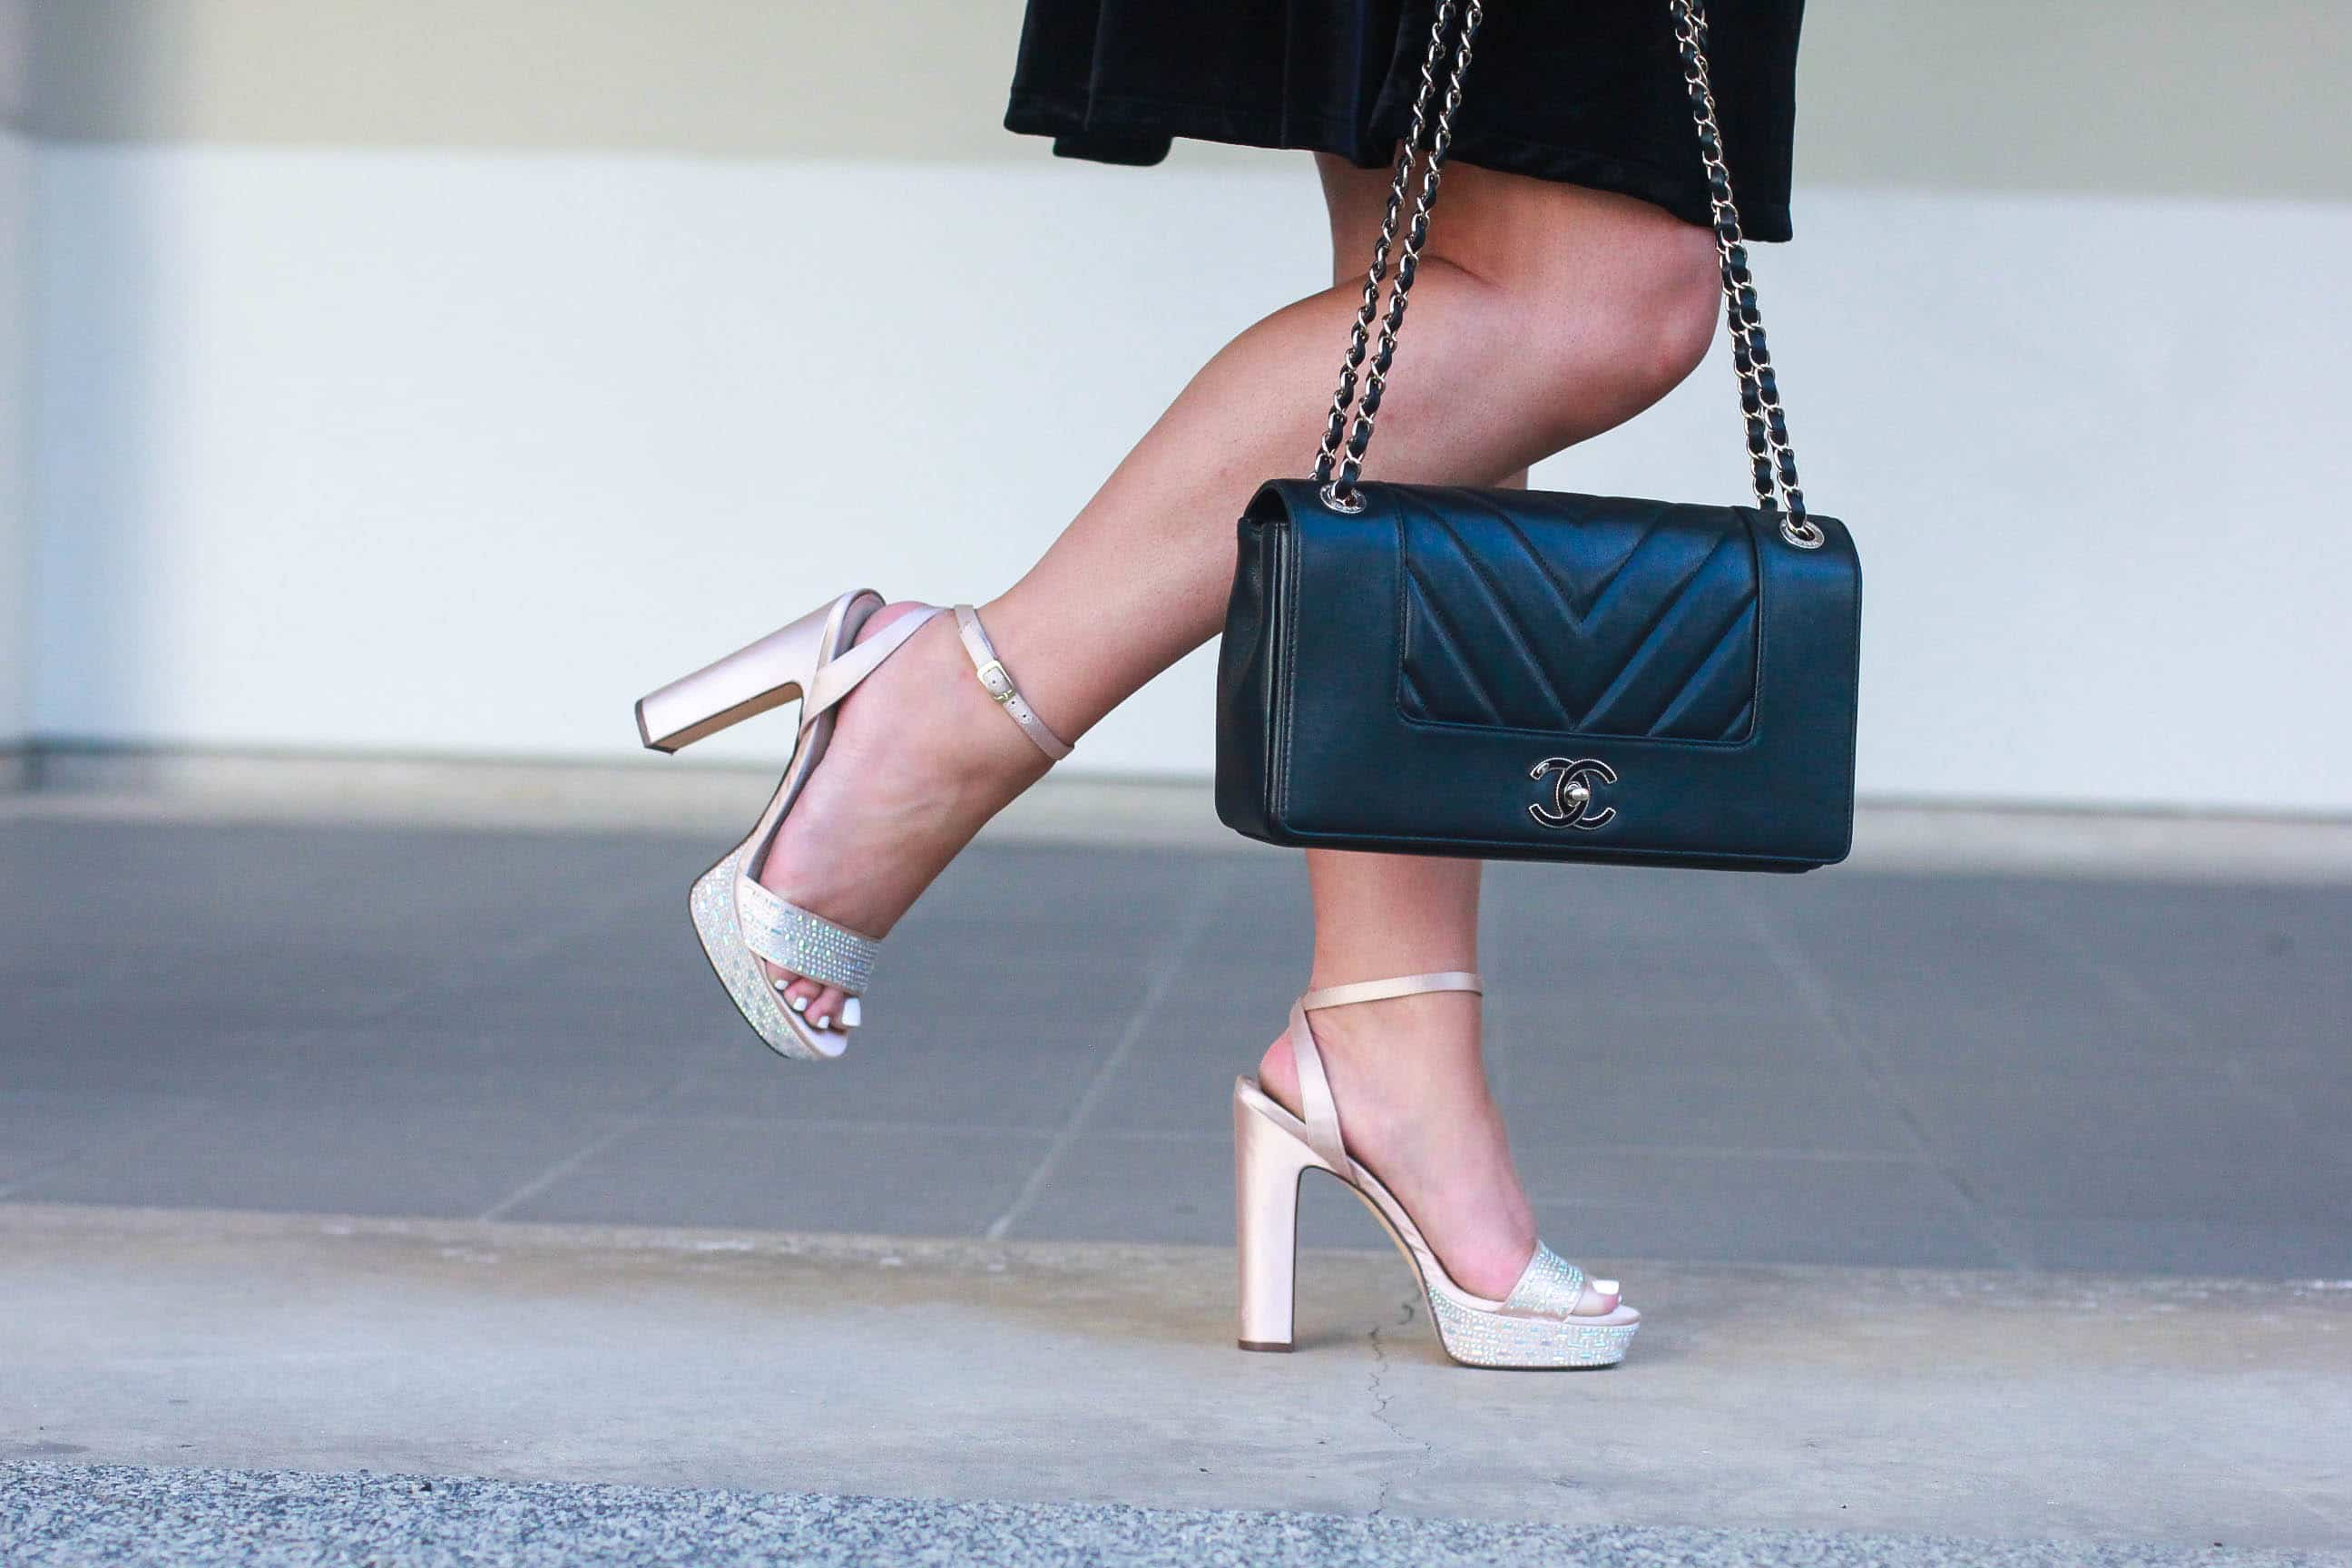 missyonmadison, missyonmadison instagram, missyonmadison blog, fashion blog, style blog, style blogger, style diaries, what i wore, old navy, velvet dress, old navy velvet dress, shaggy coat, fuzzy coat, fuzzy jacket, bedazzled shoes, platform heels, crystal heels, black velvet dress, chanel bag, chanel flap bag, what to wear for nye, nye 2017, nye 2018, nye style, new years eve style, new years style, fashion blogger, la blogger, travel blogger, melissa tierney,